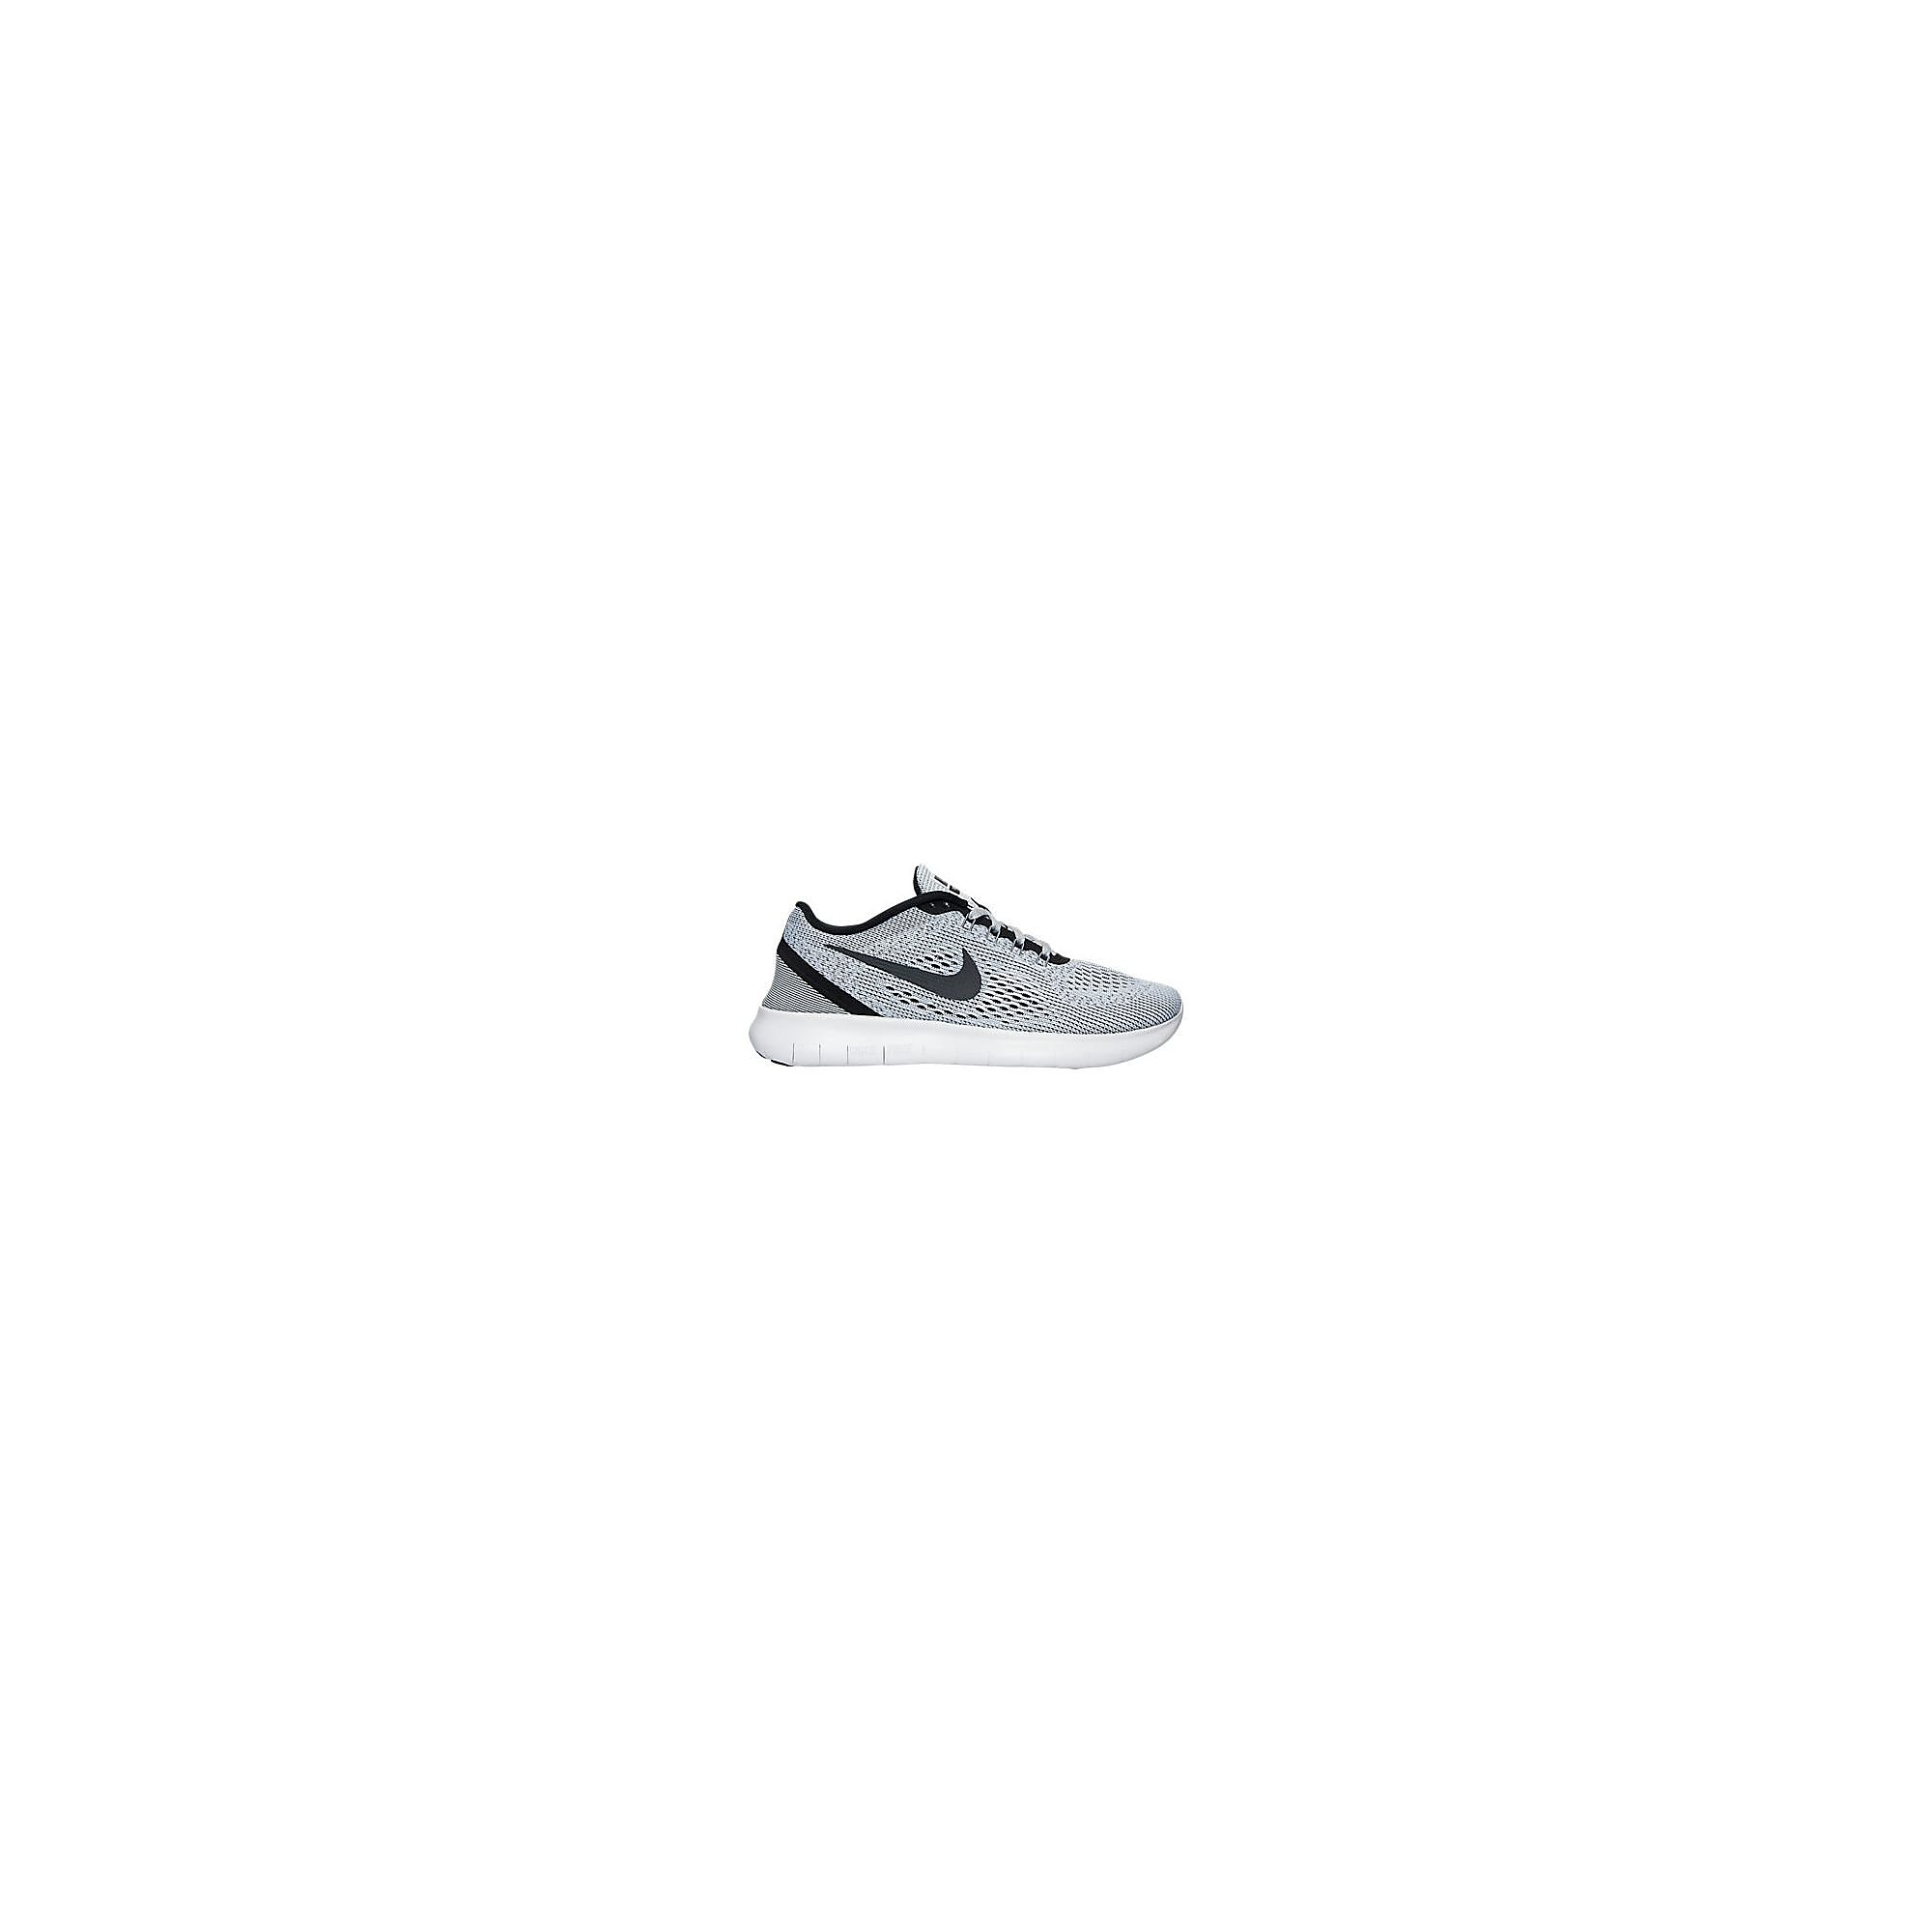 Nike WMNS NIKE FREE RN